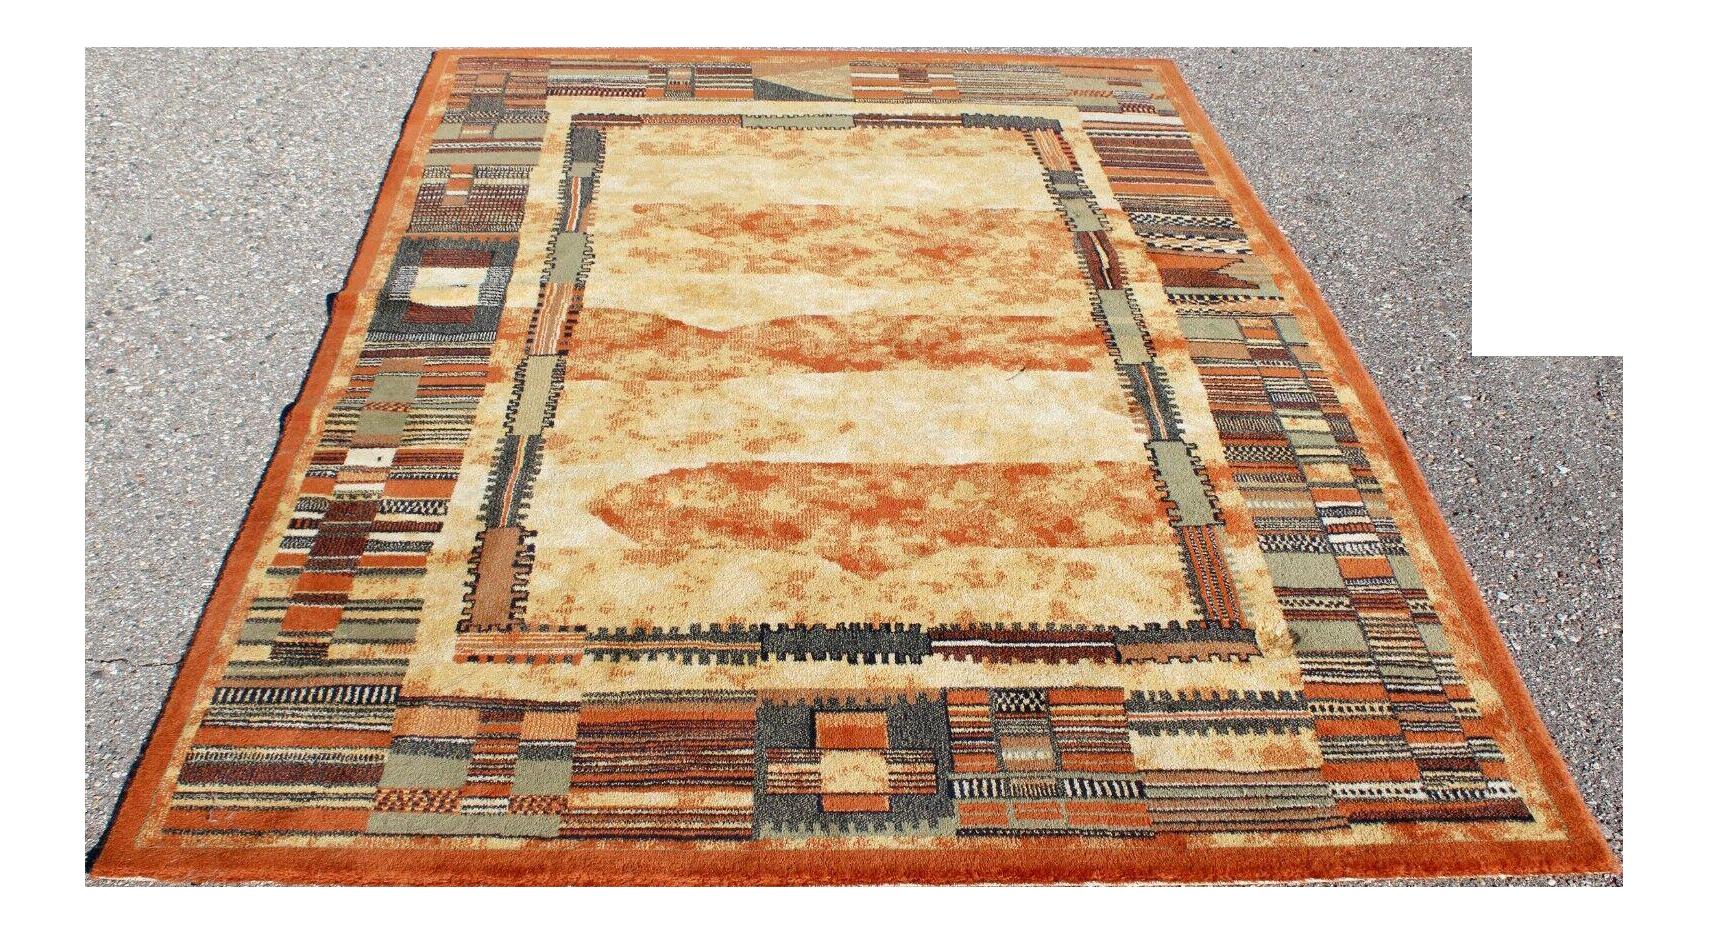 Mid Century Modern Decor Wool Wool Rectangular Area Rug 5 3 7 7